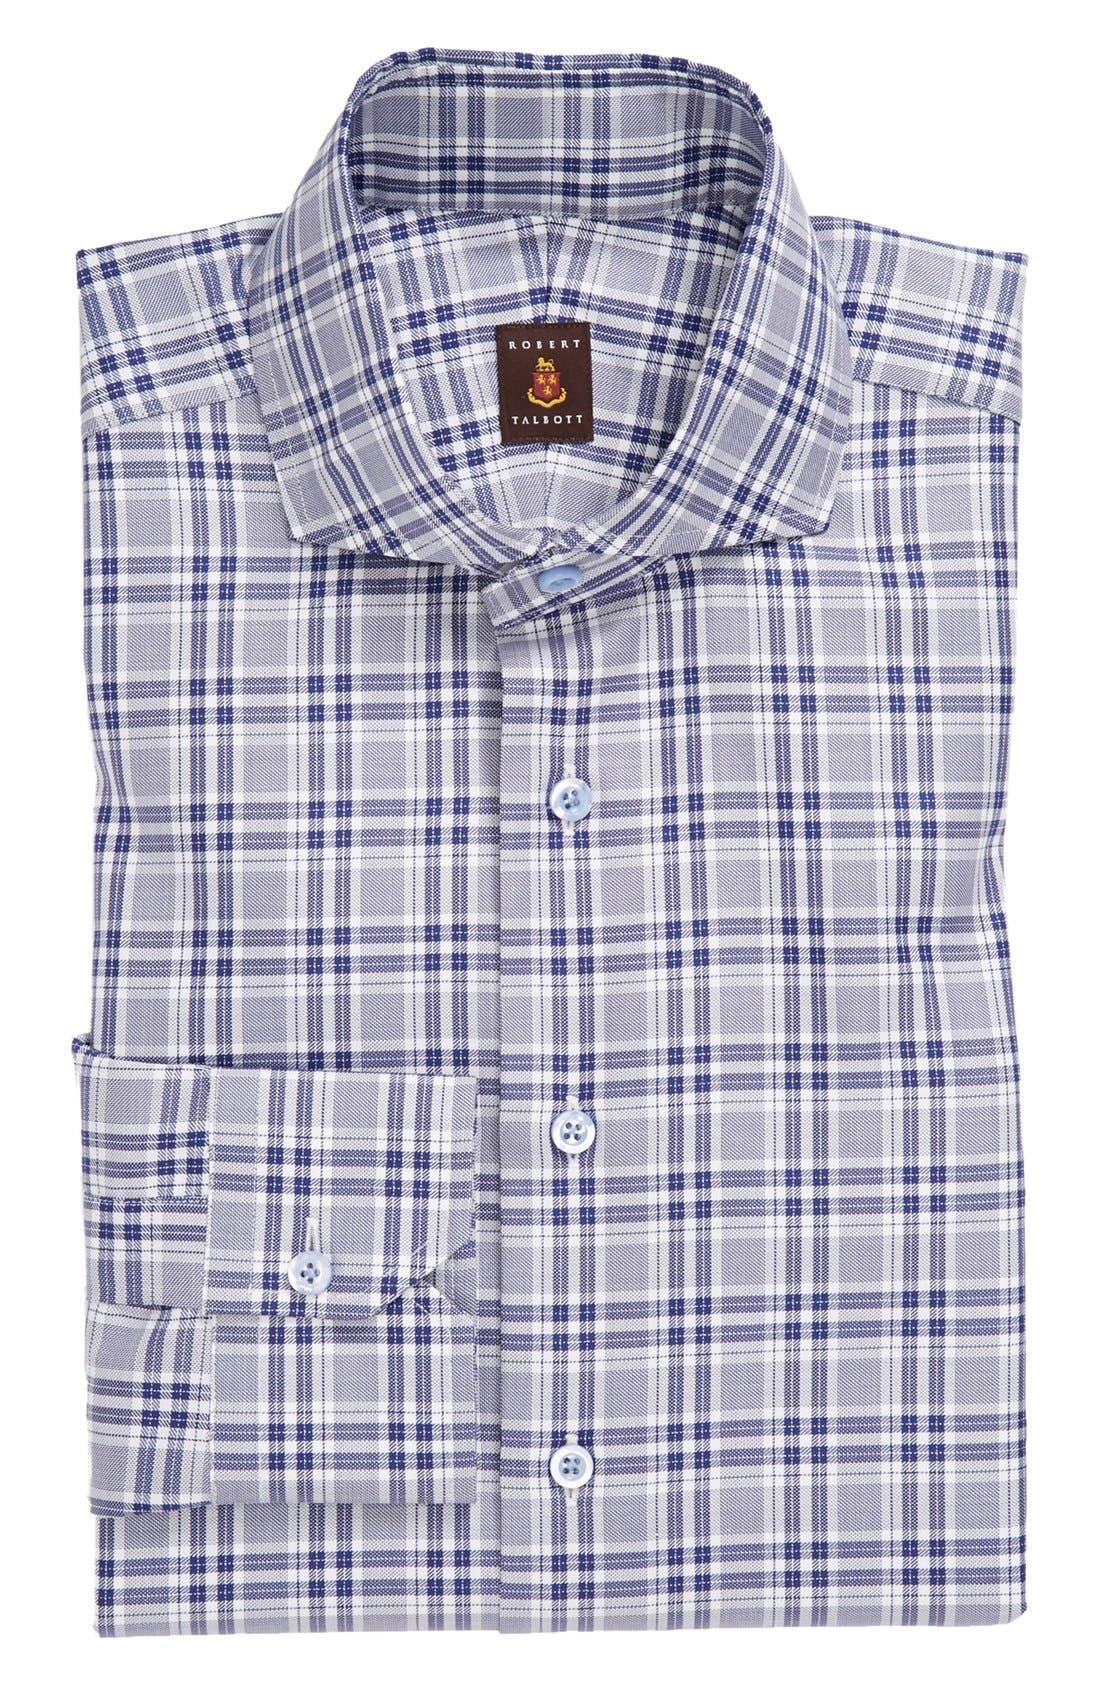 Alternate Image 1 Selected - Robert Talbott Classic Fit Dress Shirt